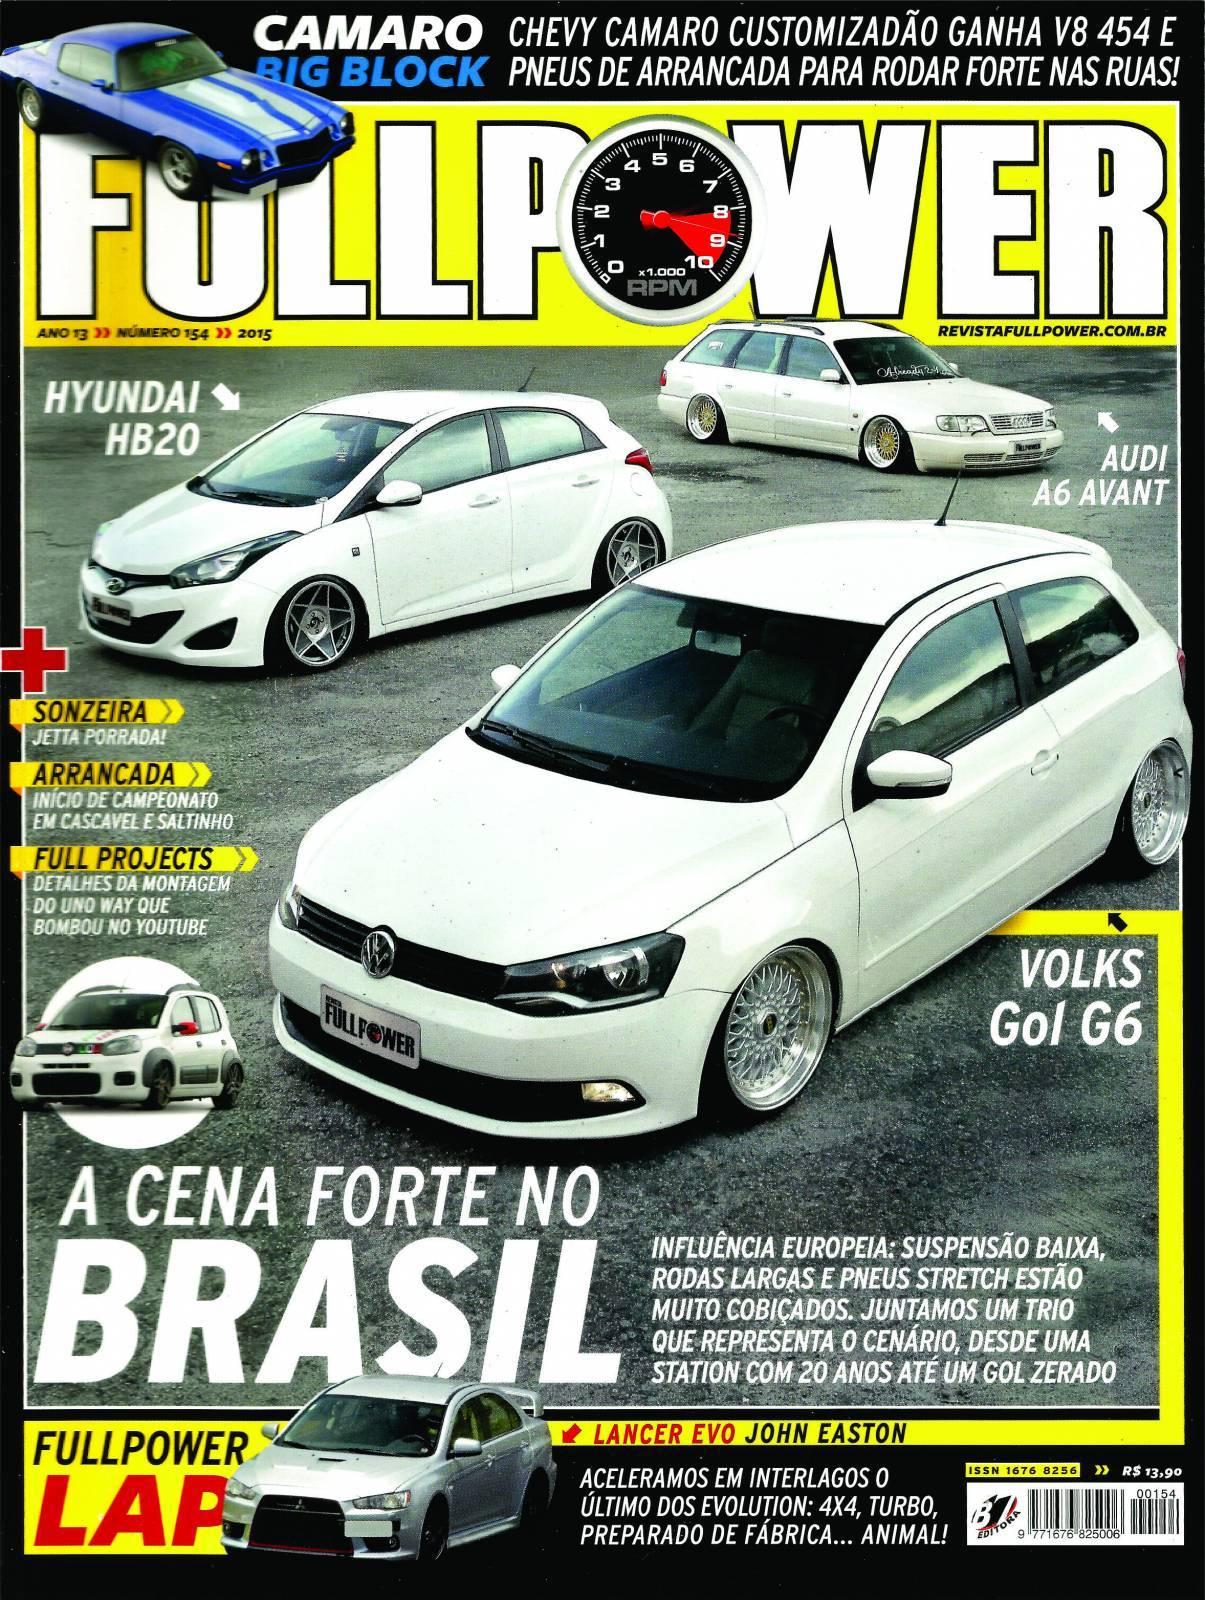 REVISTA FULLPOWER No. 154 ANO 2015 - Loja FullPower